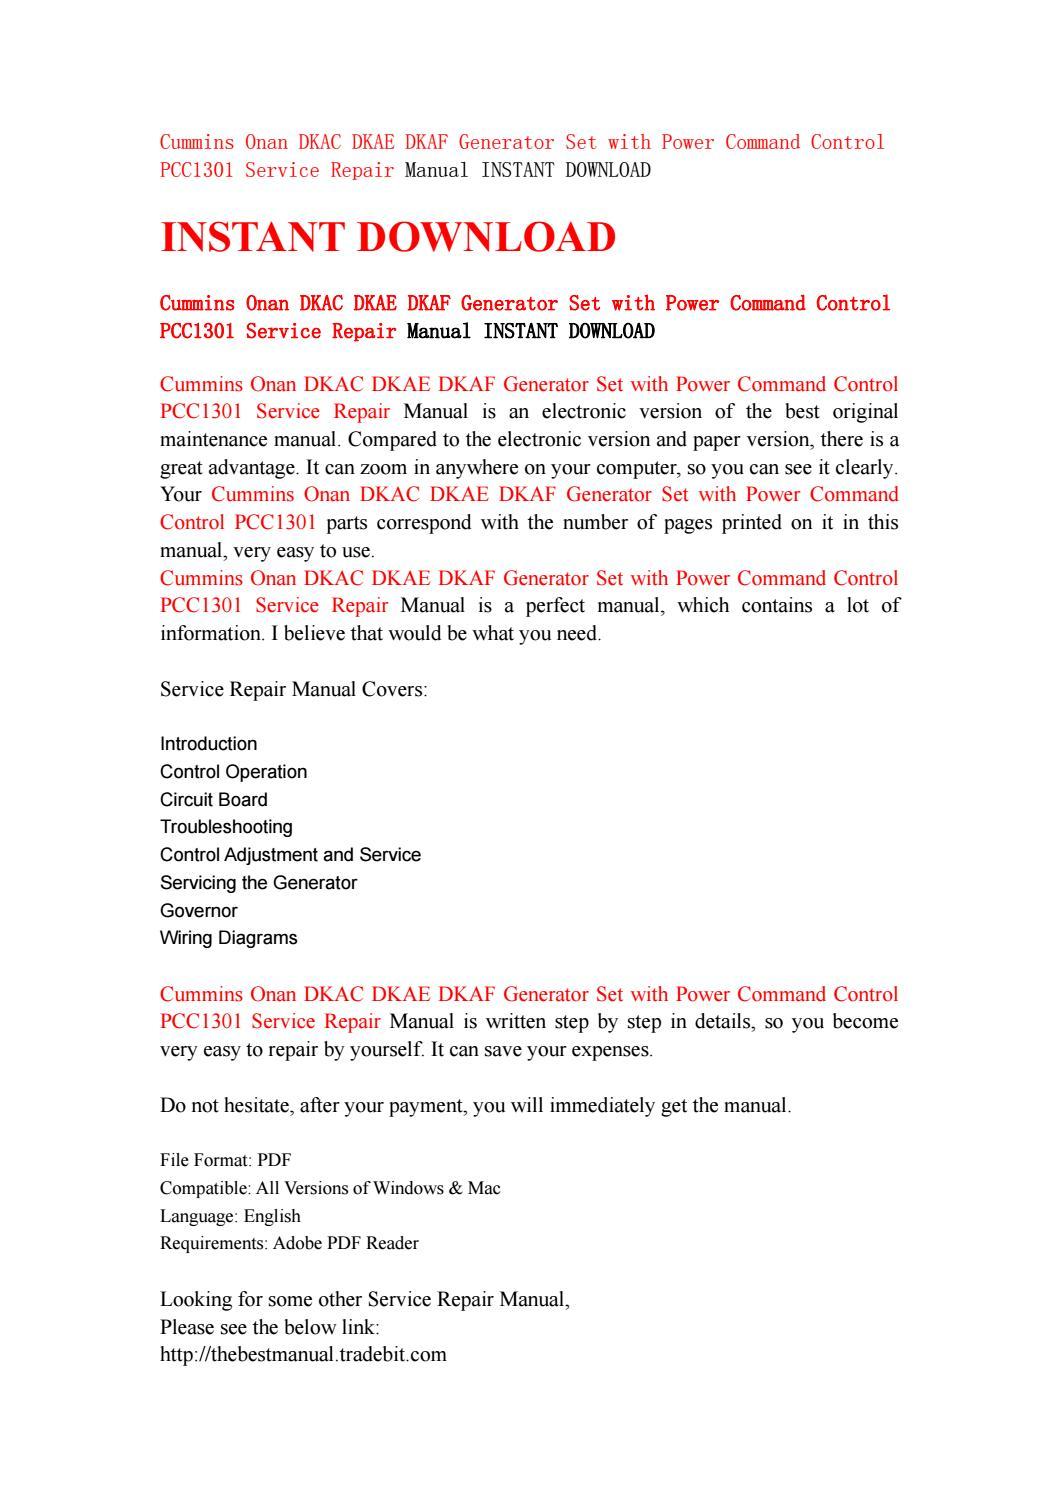 Cummins onan dkac dkae dkaf generator set with power command control  pcc1301 service repair manual i by kjsnfhsenf - issuu